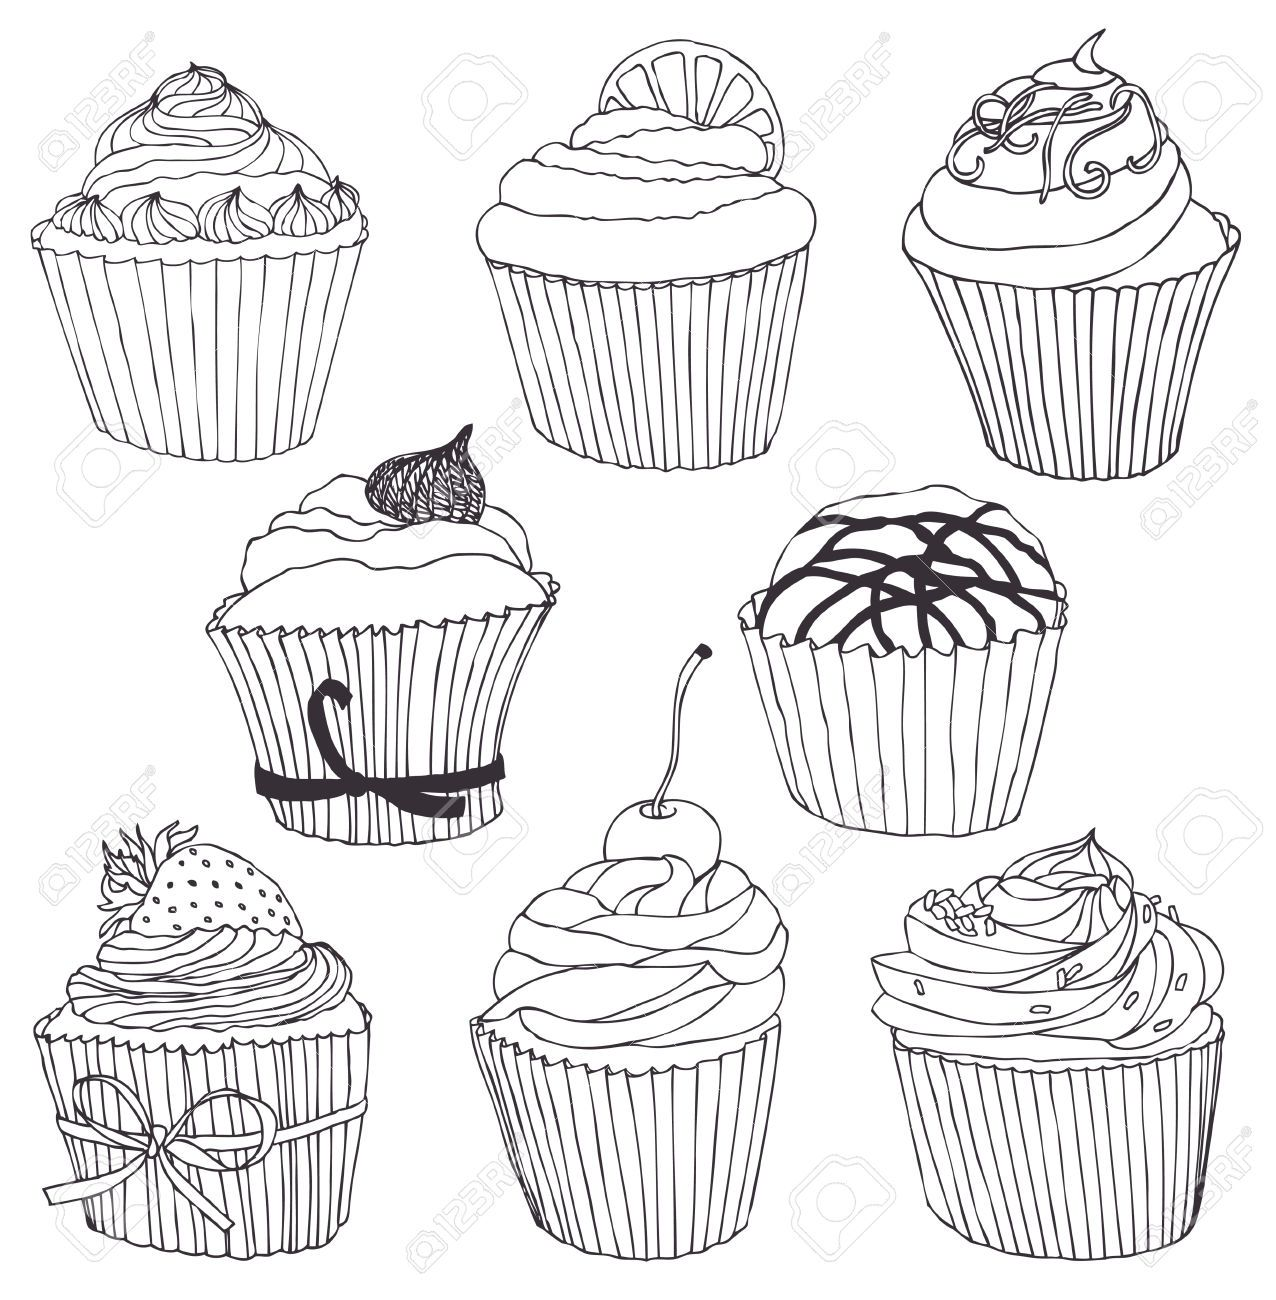 Cupcake Drawing Black And White